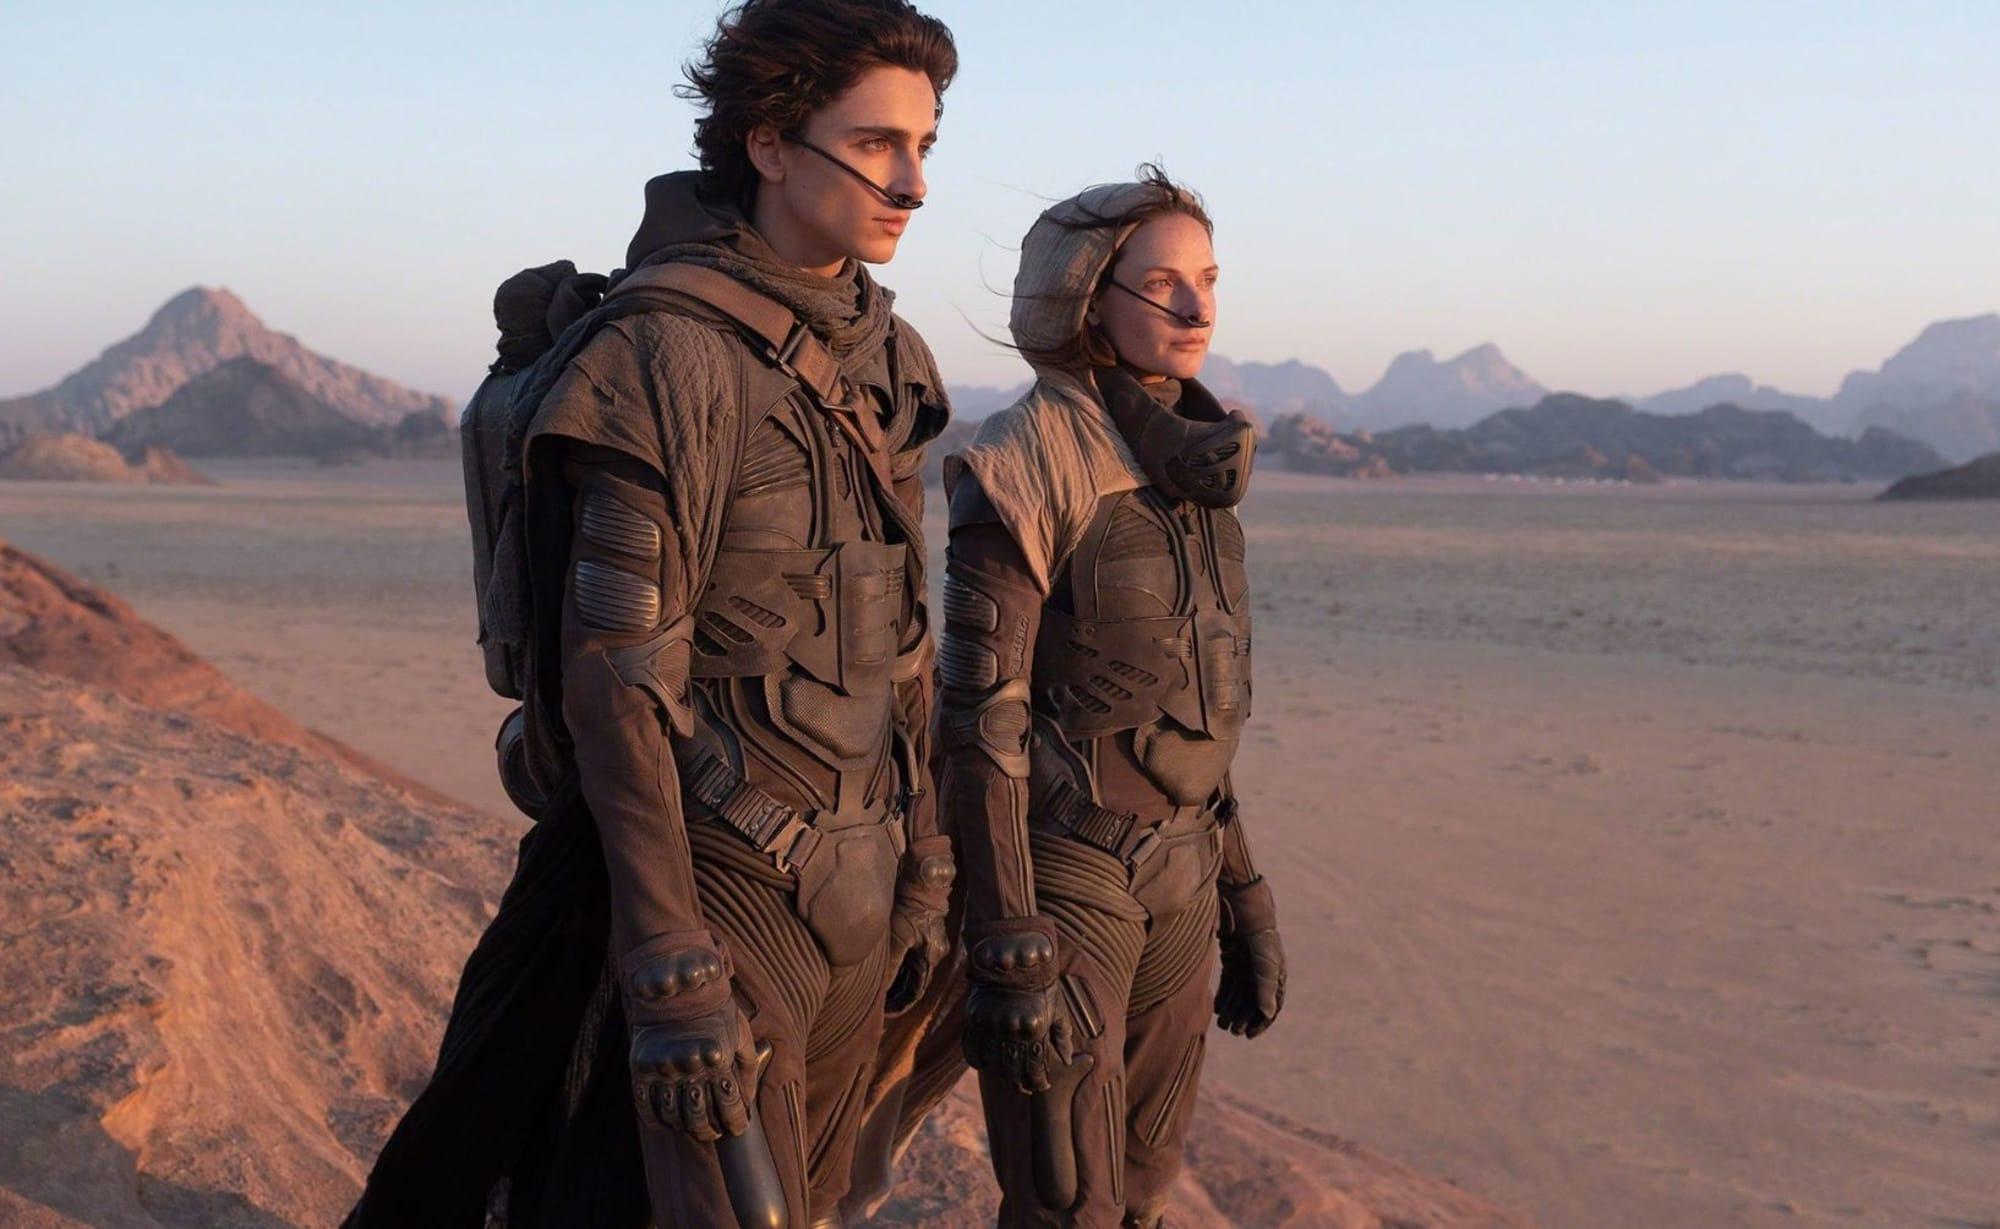 Ahead of new movie, Frank Herbert's Dune book is back on bestseller lists